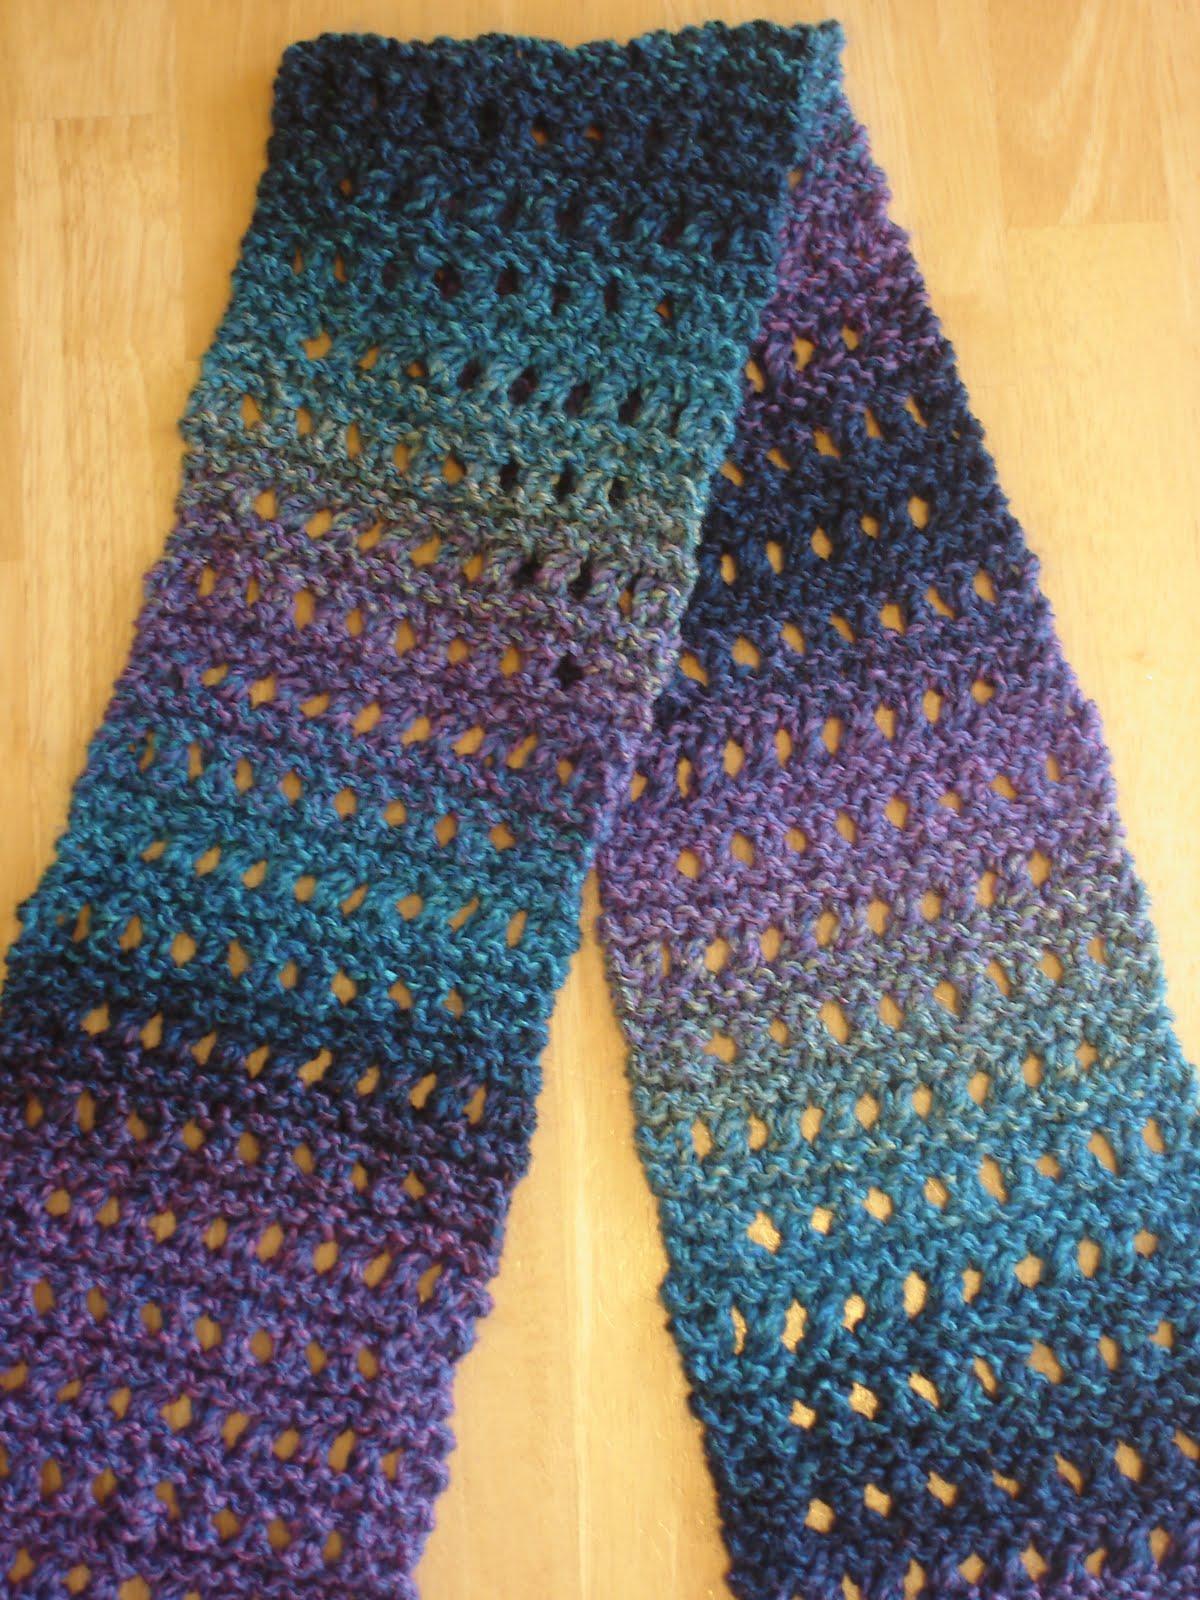 free knitting patterns for scarves audknits gentle stripes scarf free knitting pattern. view larger bsjiwzi